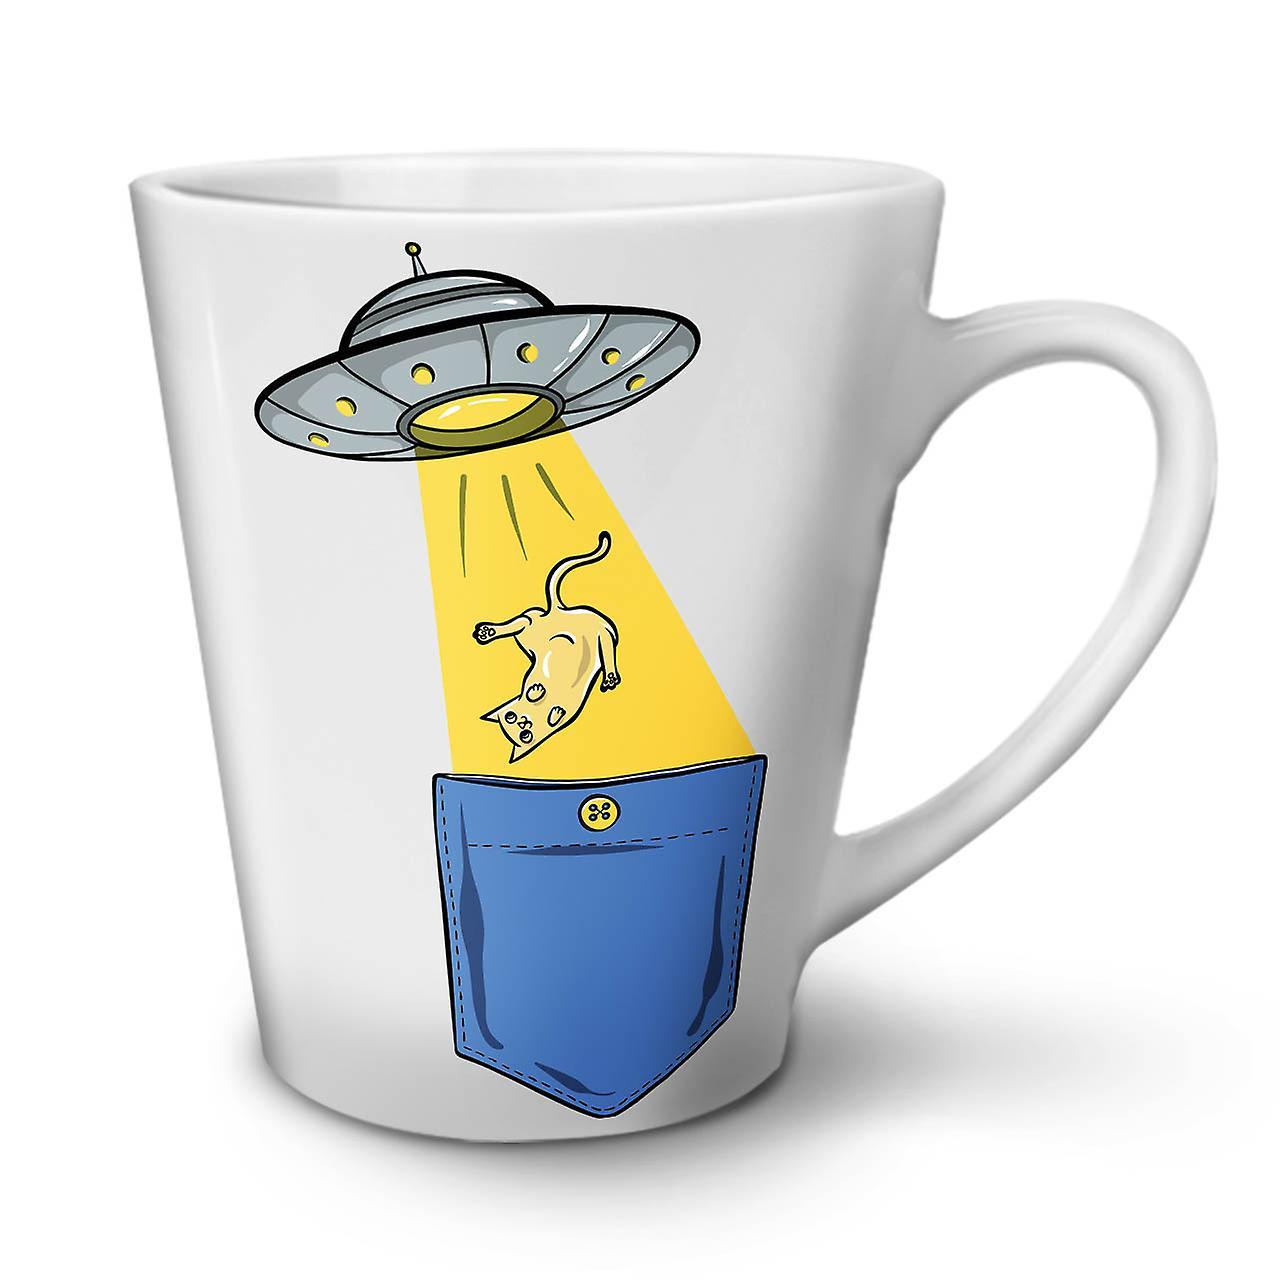 Coffee Ceramic Mug Beings Abduction Latte OzWellcoda New White Tea 12 YbgfvI76y